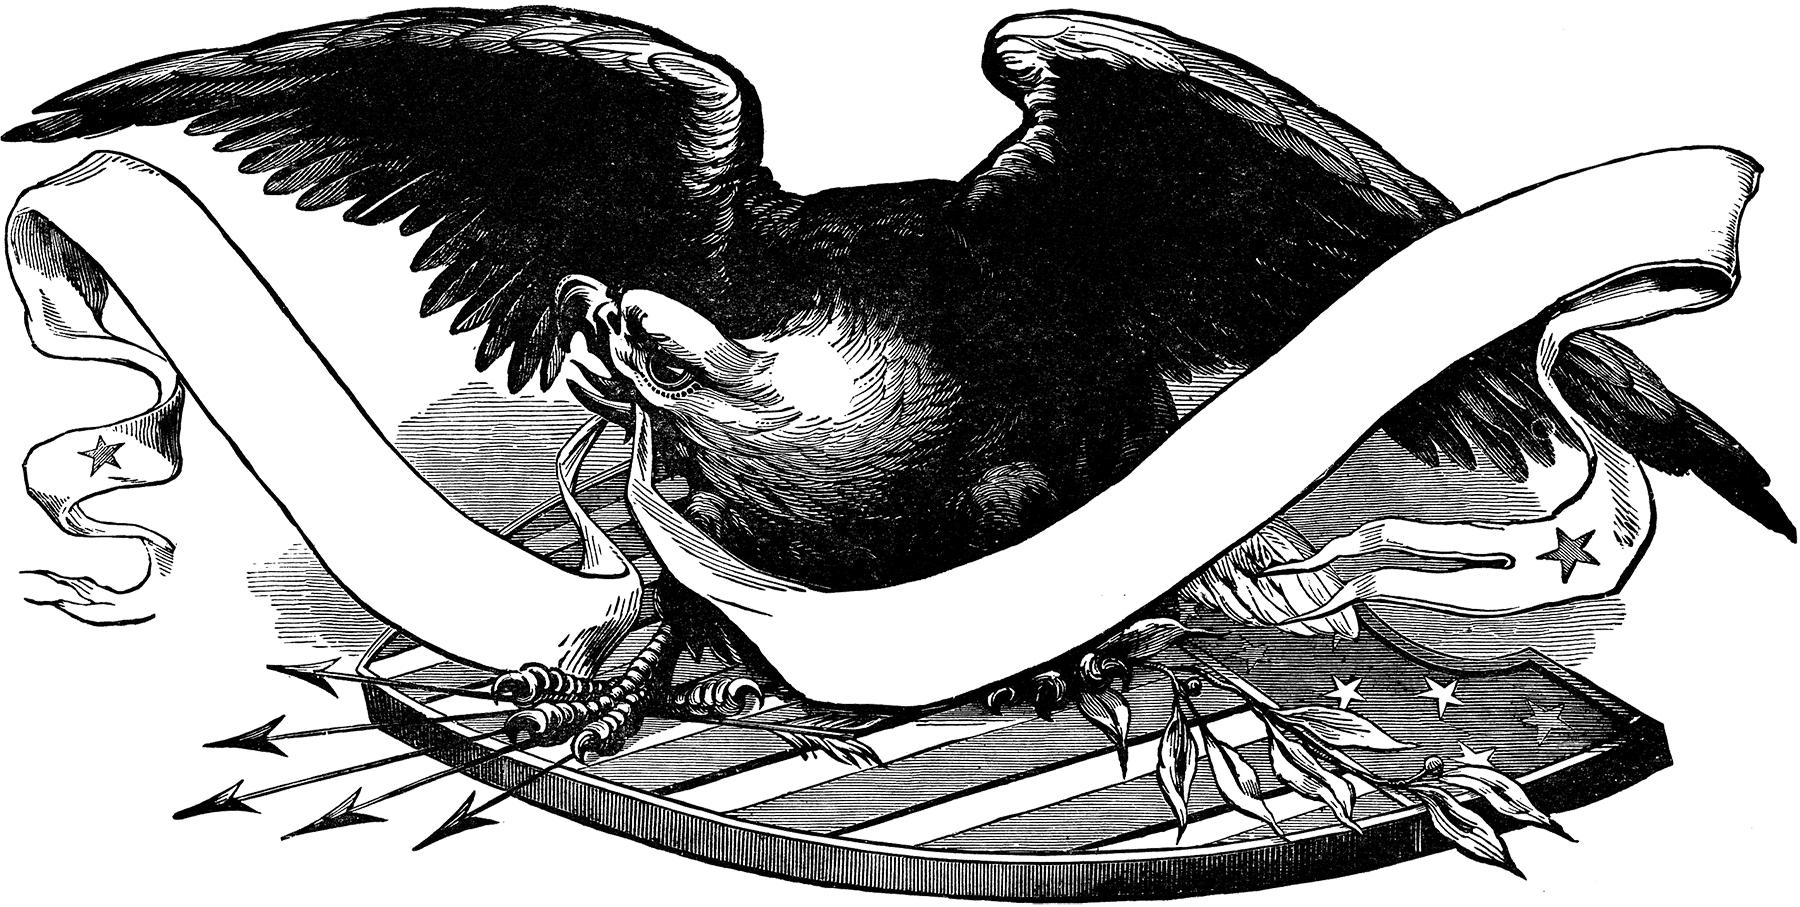 Black Eagle clipart patriotic Graphics Fairy Eagle The Image